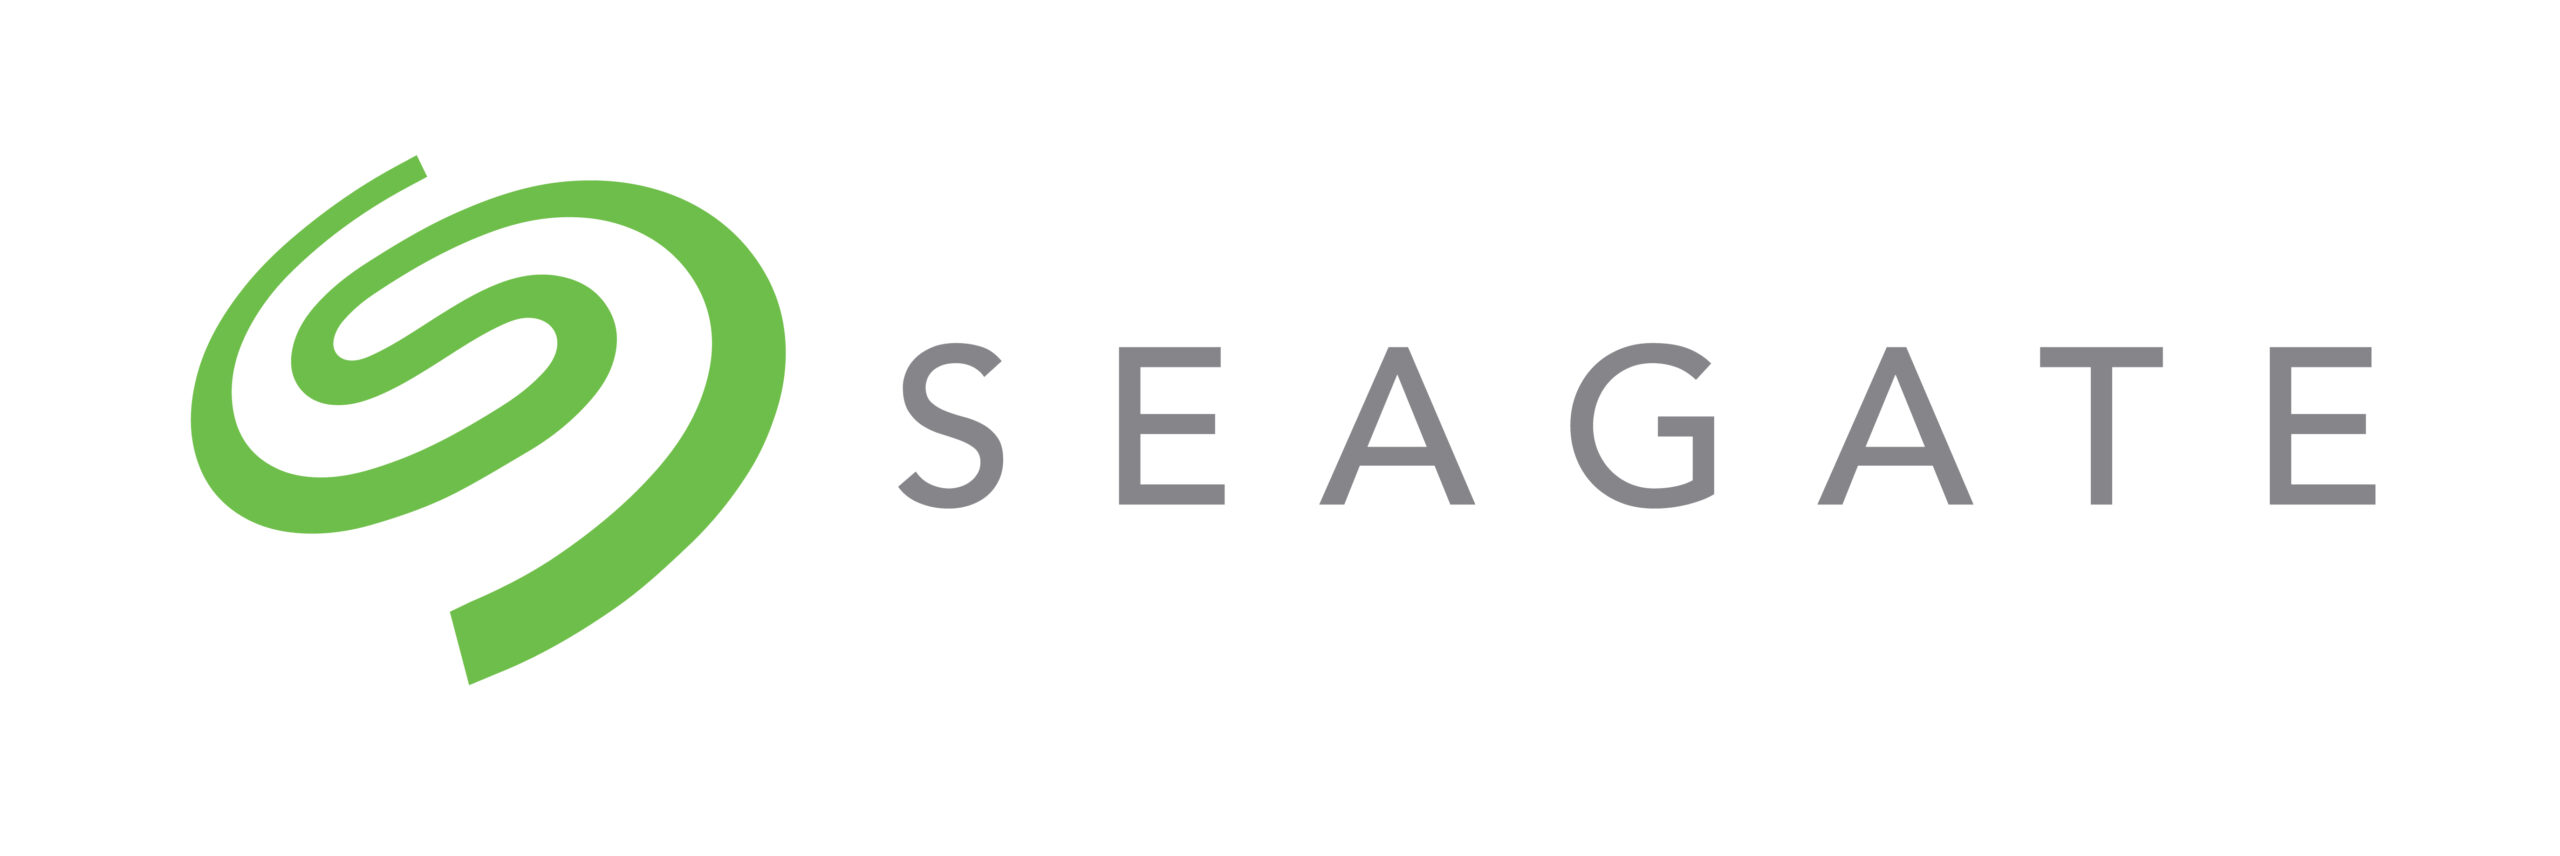 seagate_PMS_horizontal_pos